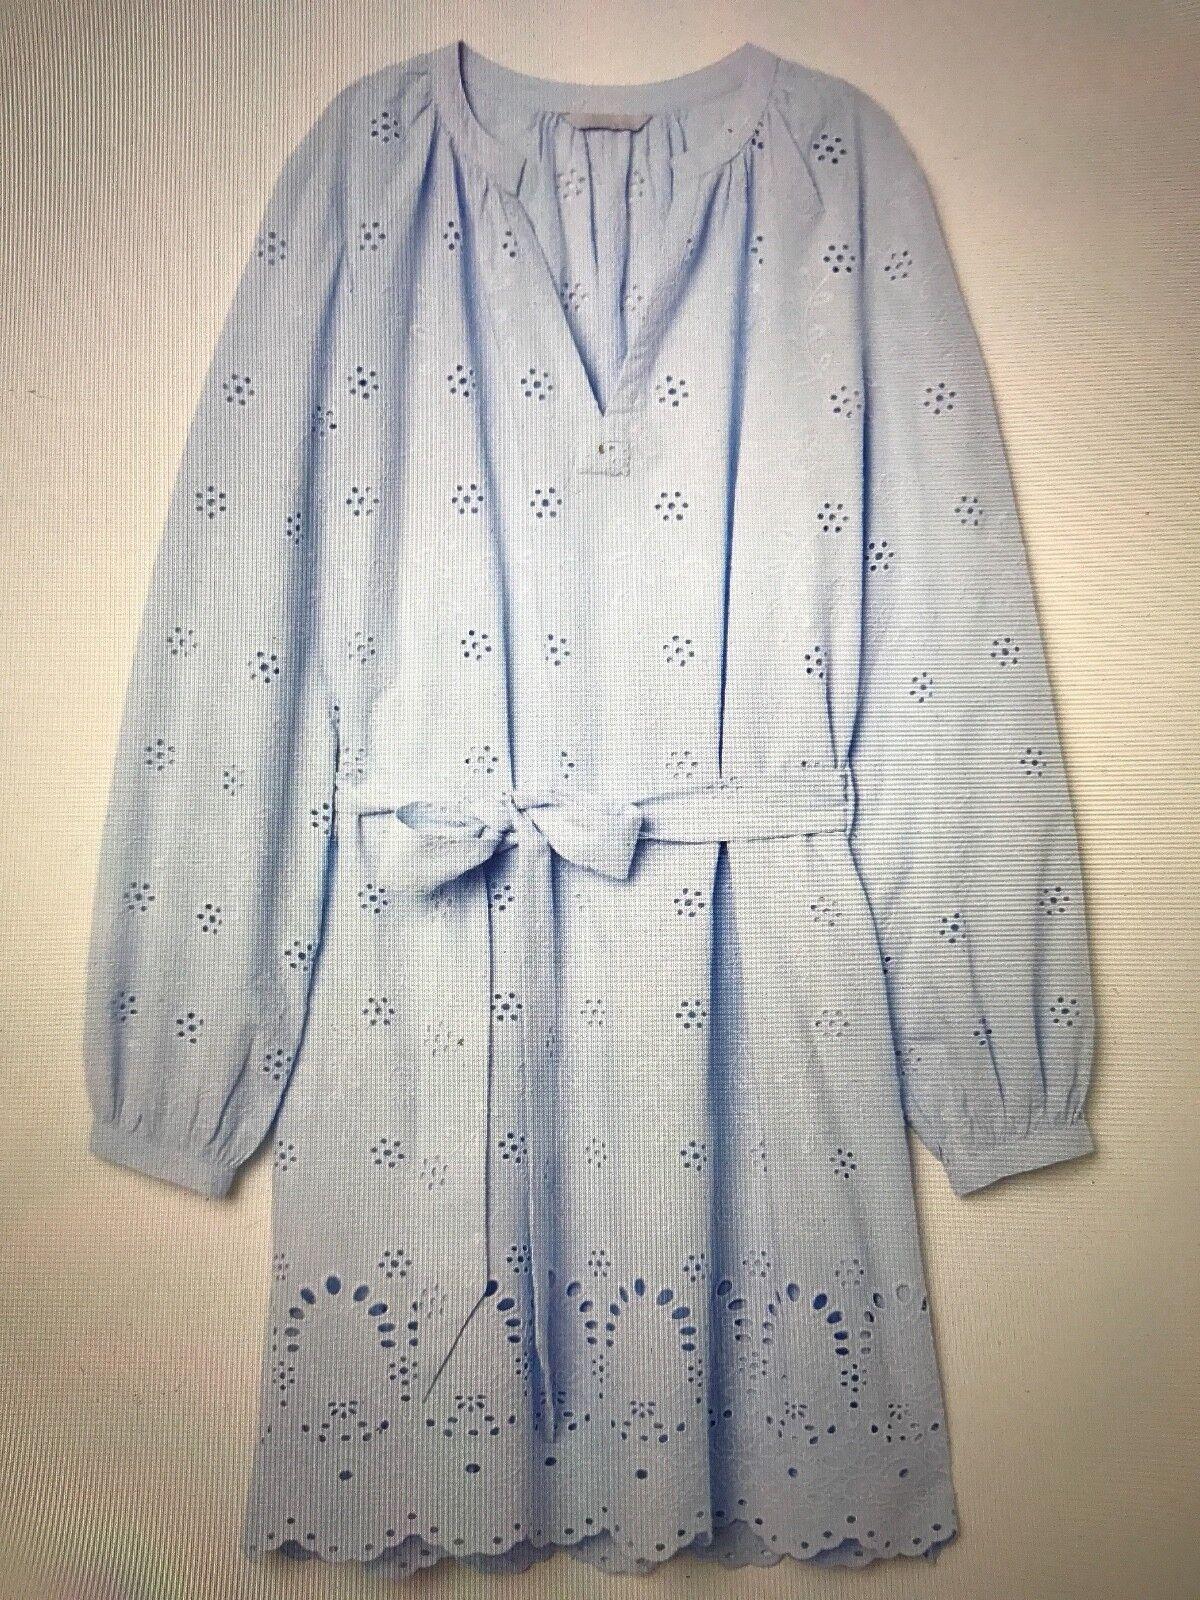 NWT Elegant & Beautiful H&M SKY blueE blueE blueE BRODERIE ANGLAISE Long Sleeves DRESS Size L e8deb8